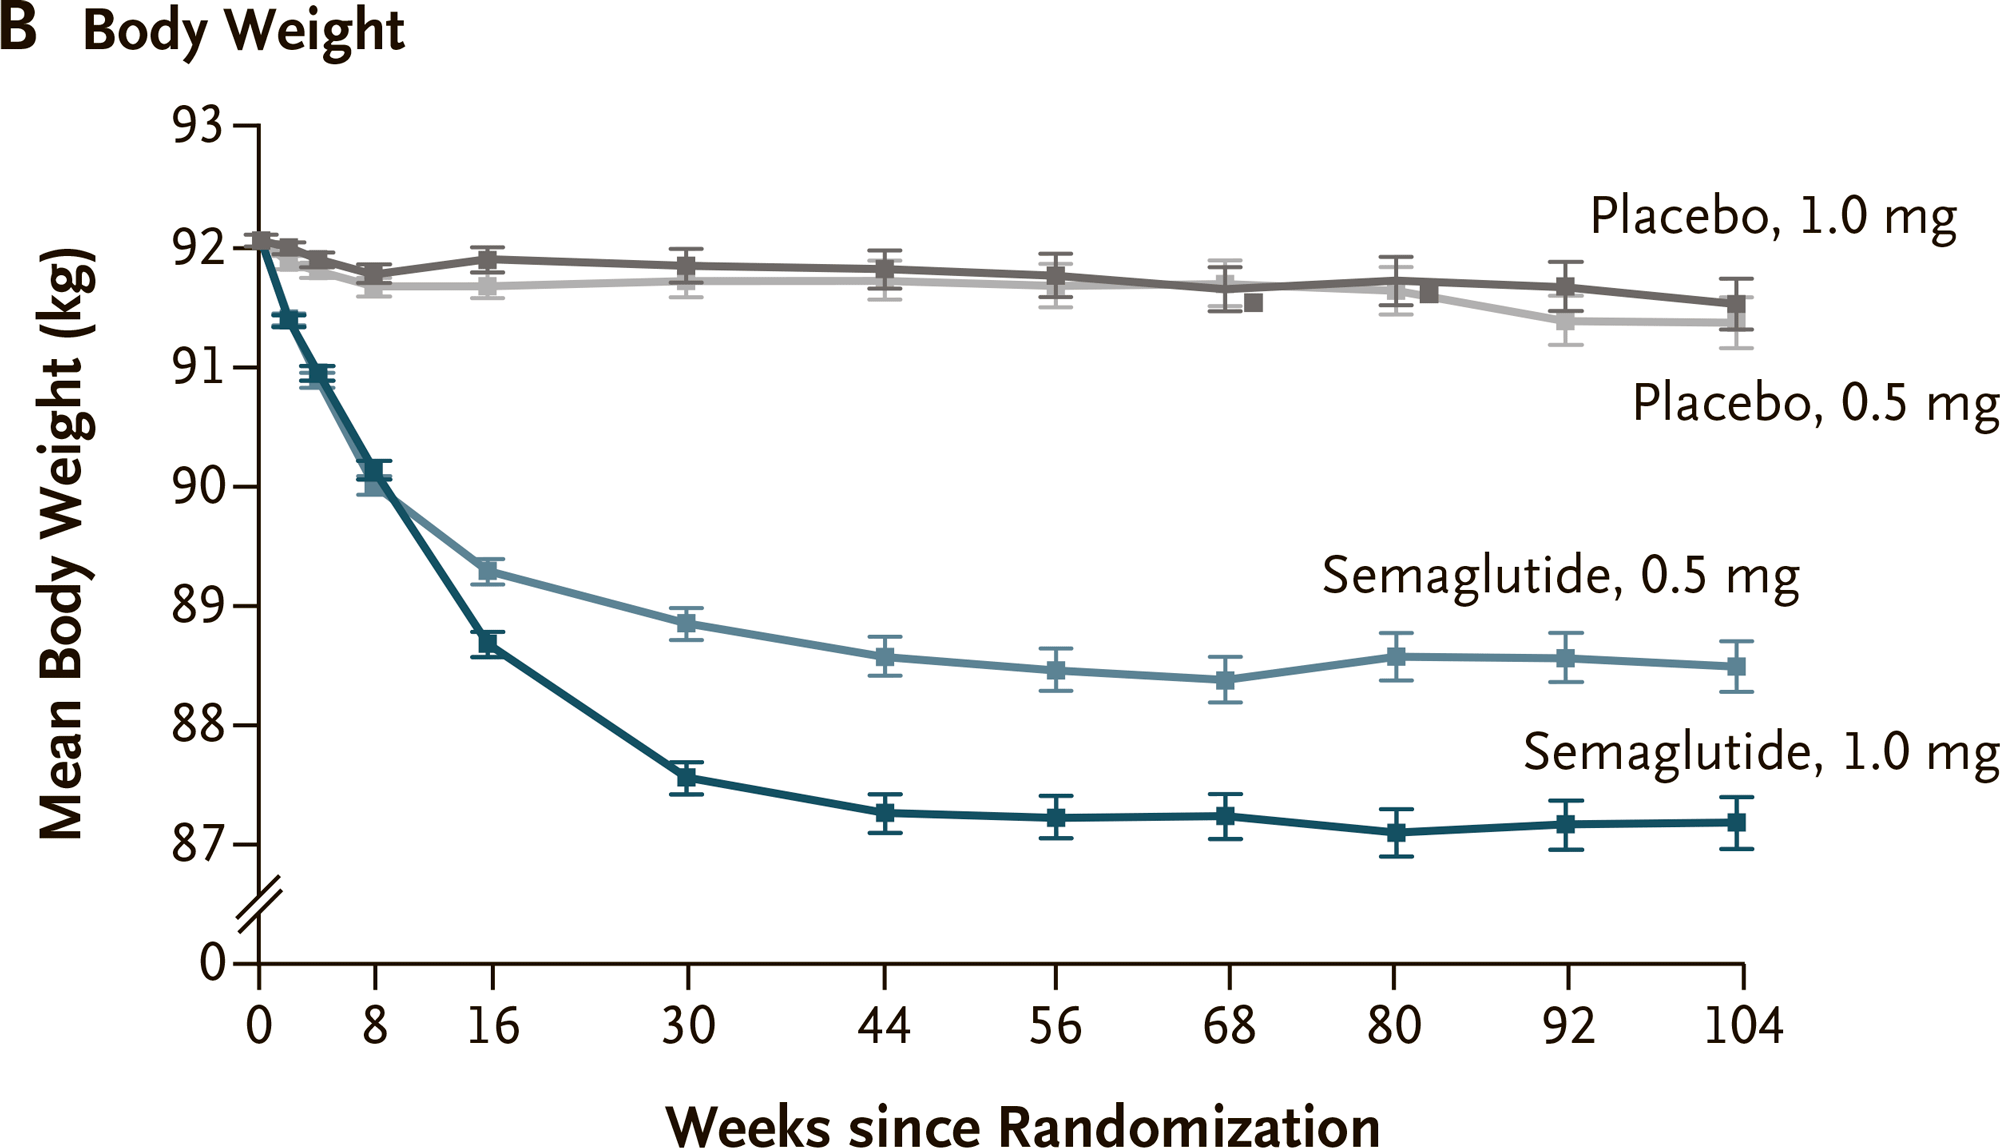 nct01720446 results 07 - Семаглутид спасет сердце диабетиков